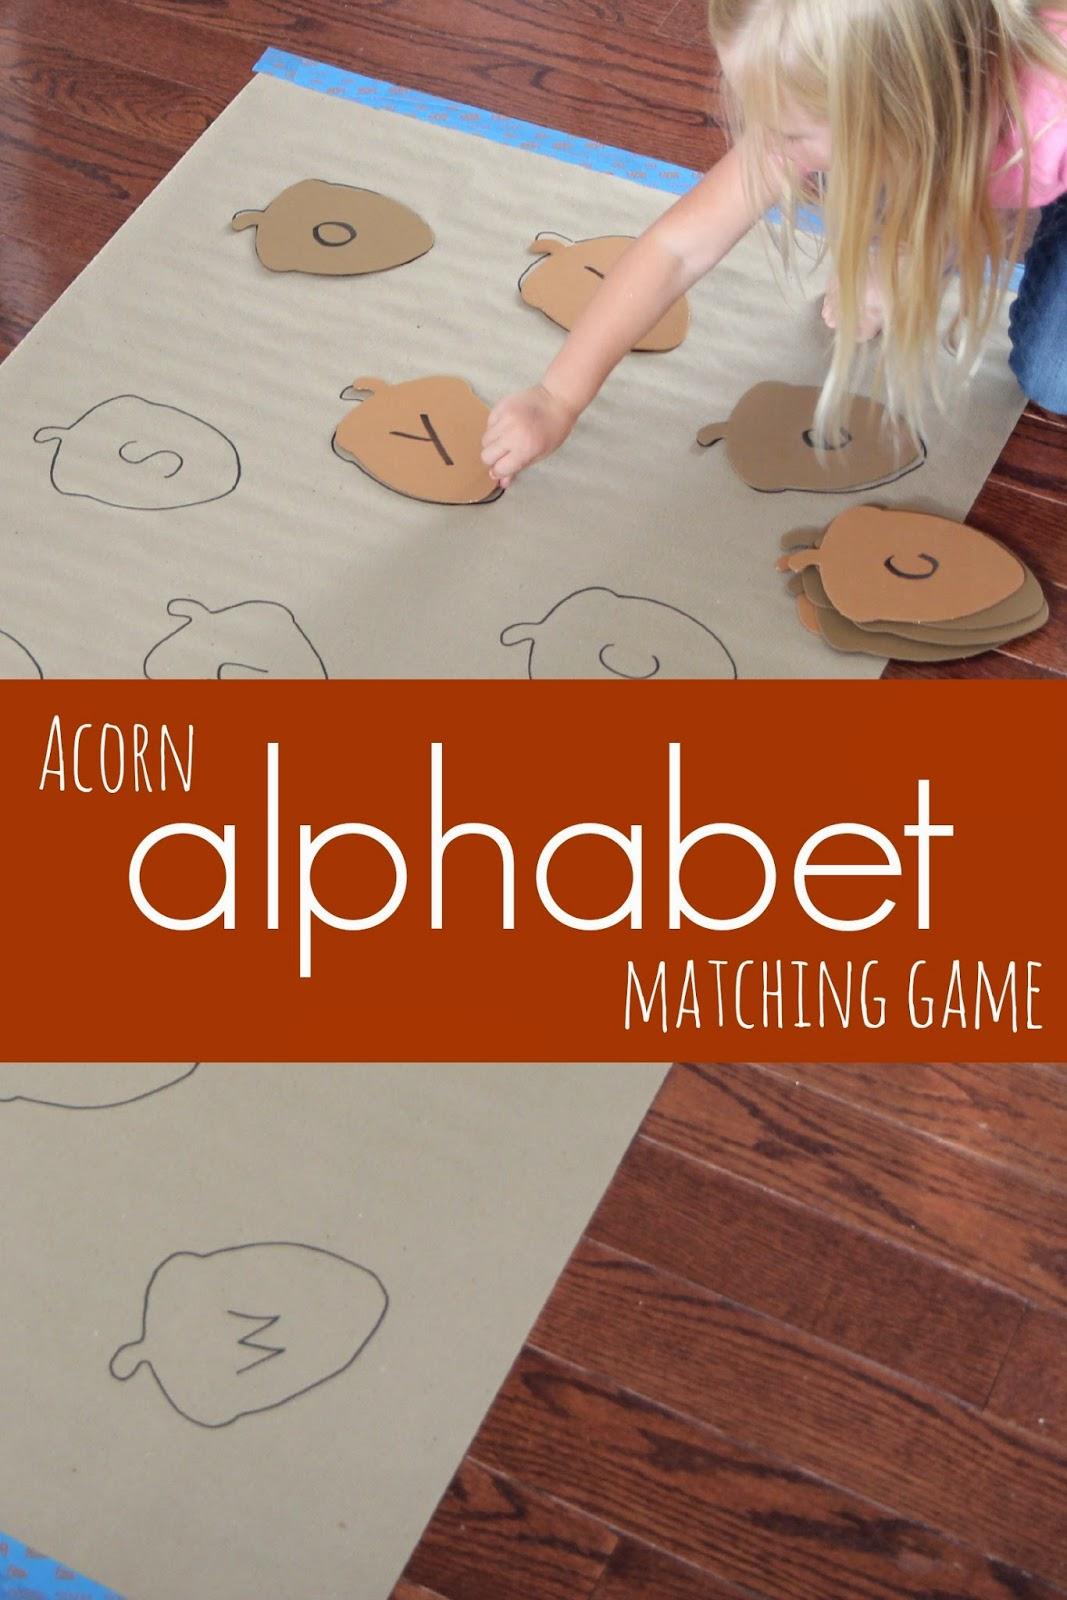 Acorn Alphabet Matching Game